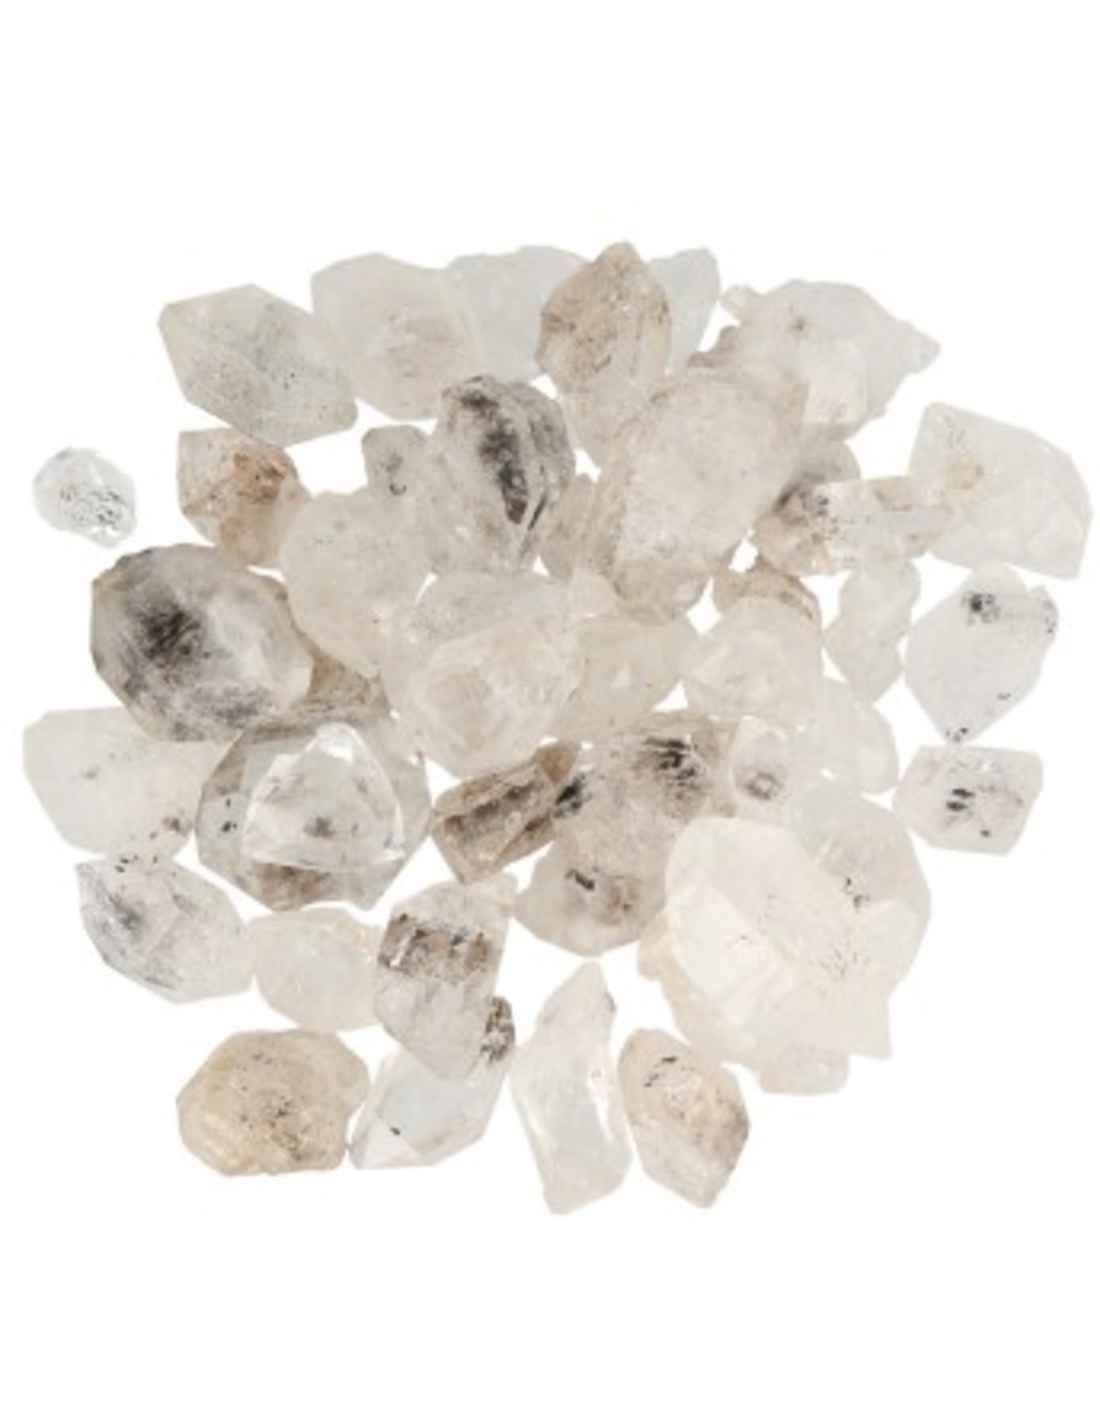 Herkimer diamant ruw 100 gr.